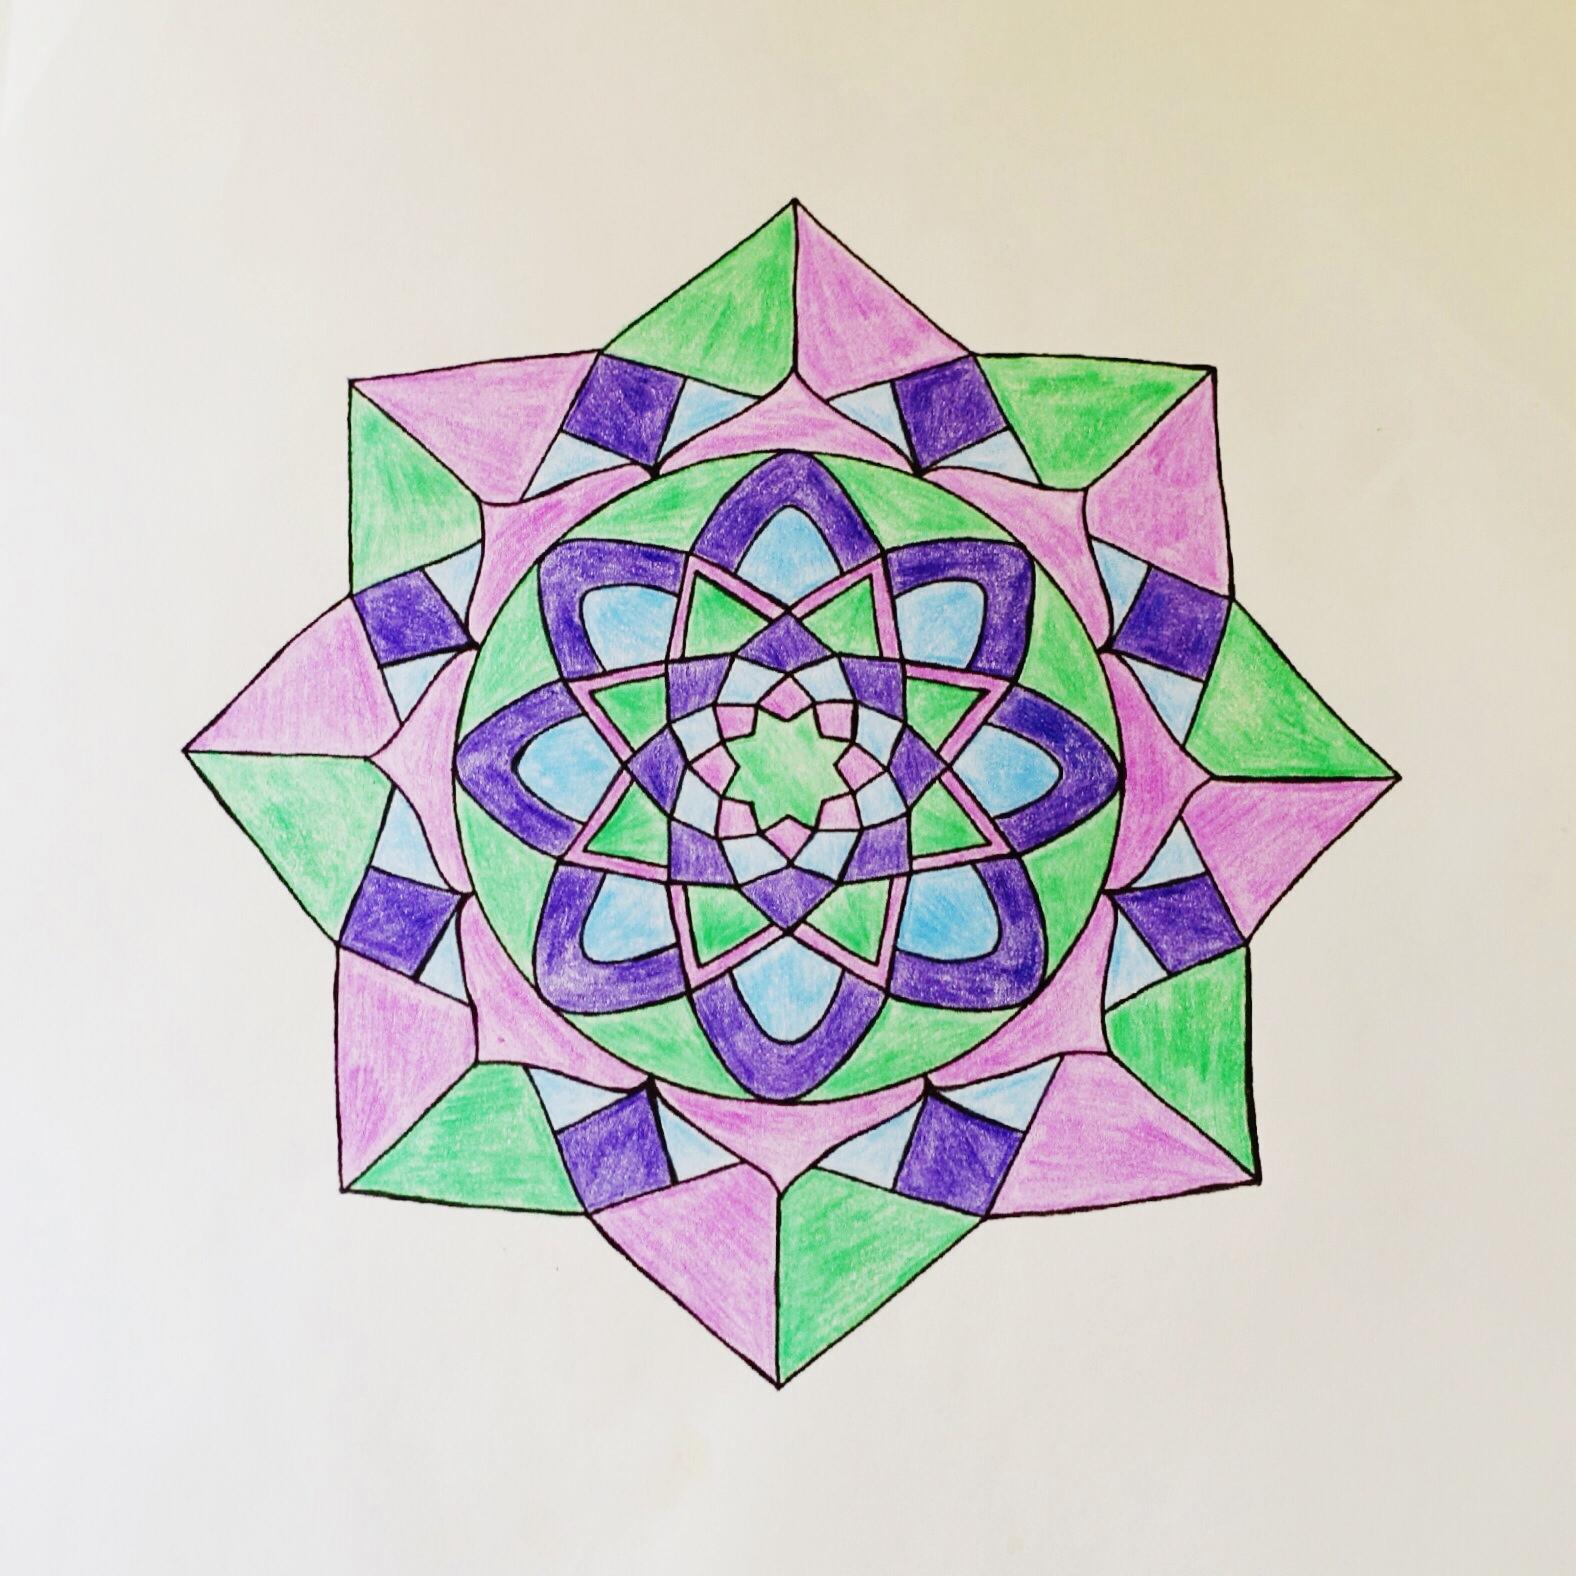 The Gratitude Diaries: Birthdays, Abundance, Mandalas & More http://oneinfinitelife.com/the-gratitude-diaries-12/